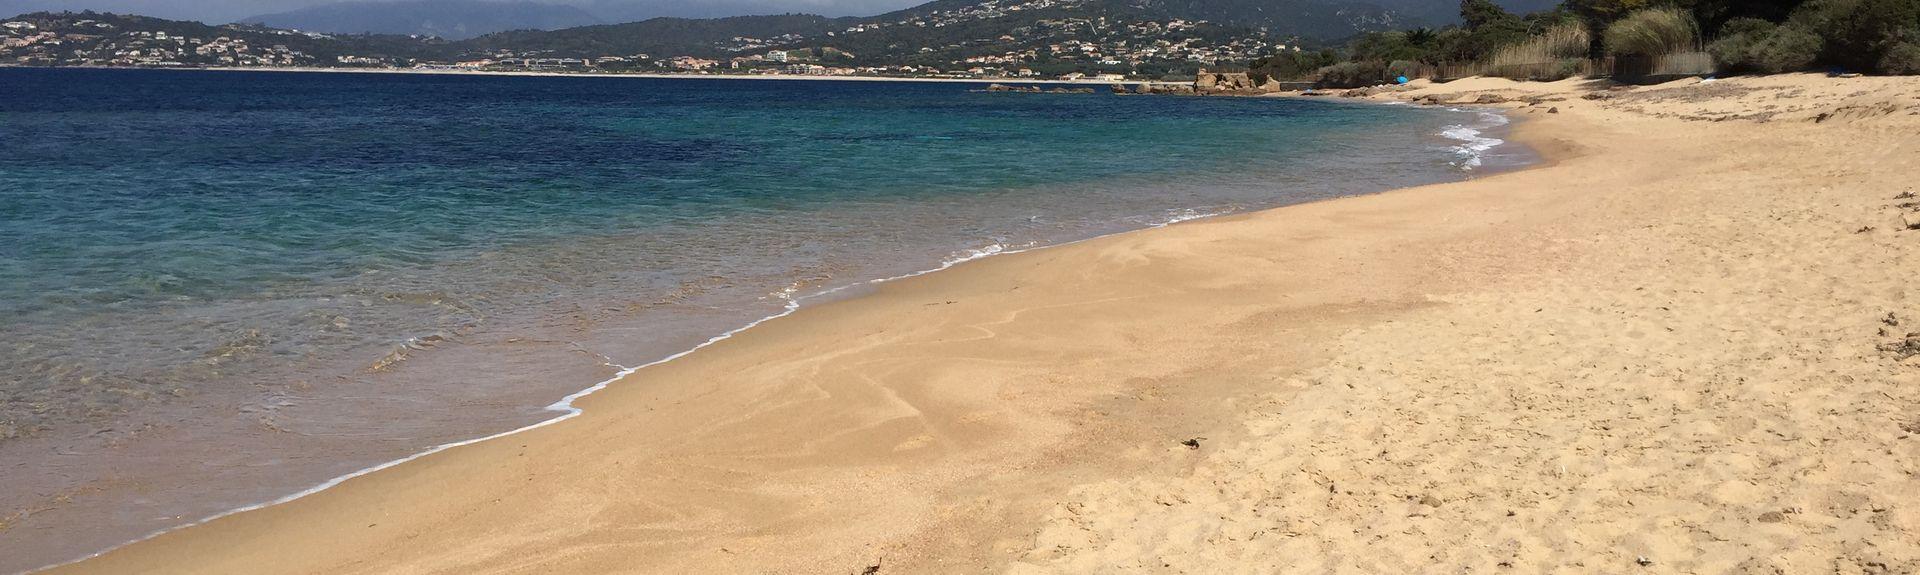 Isolella, Corse du Sud, France